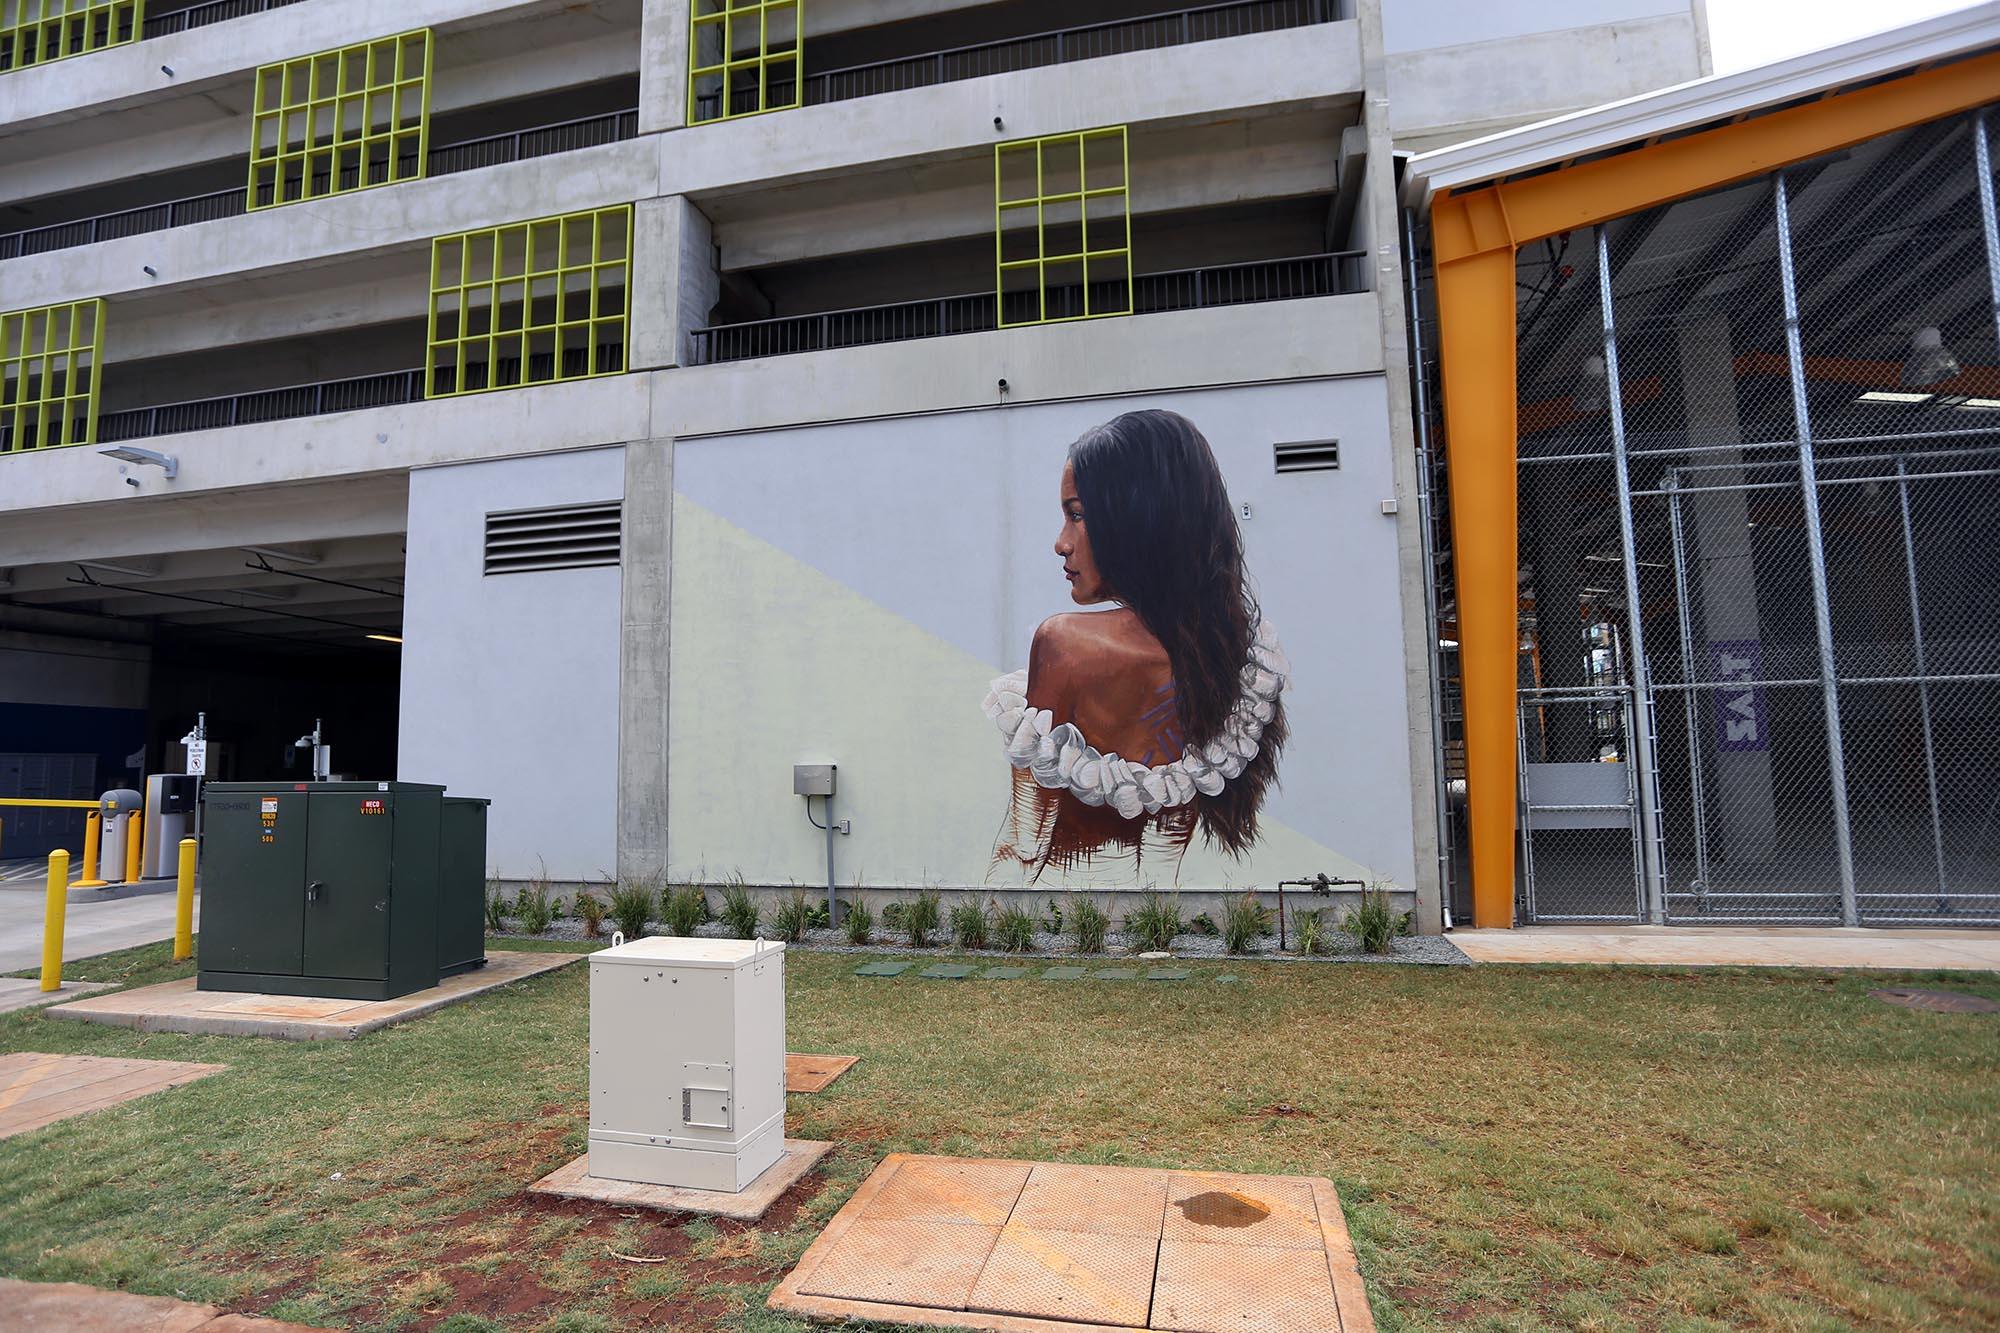 hula-pow-wow-festival-grafite-mural-dionisio-arte (4)